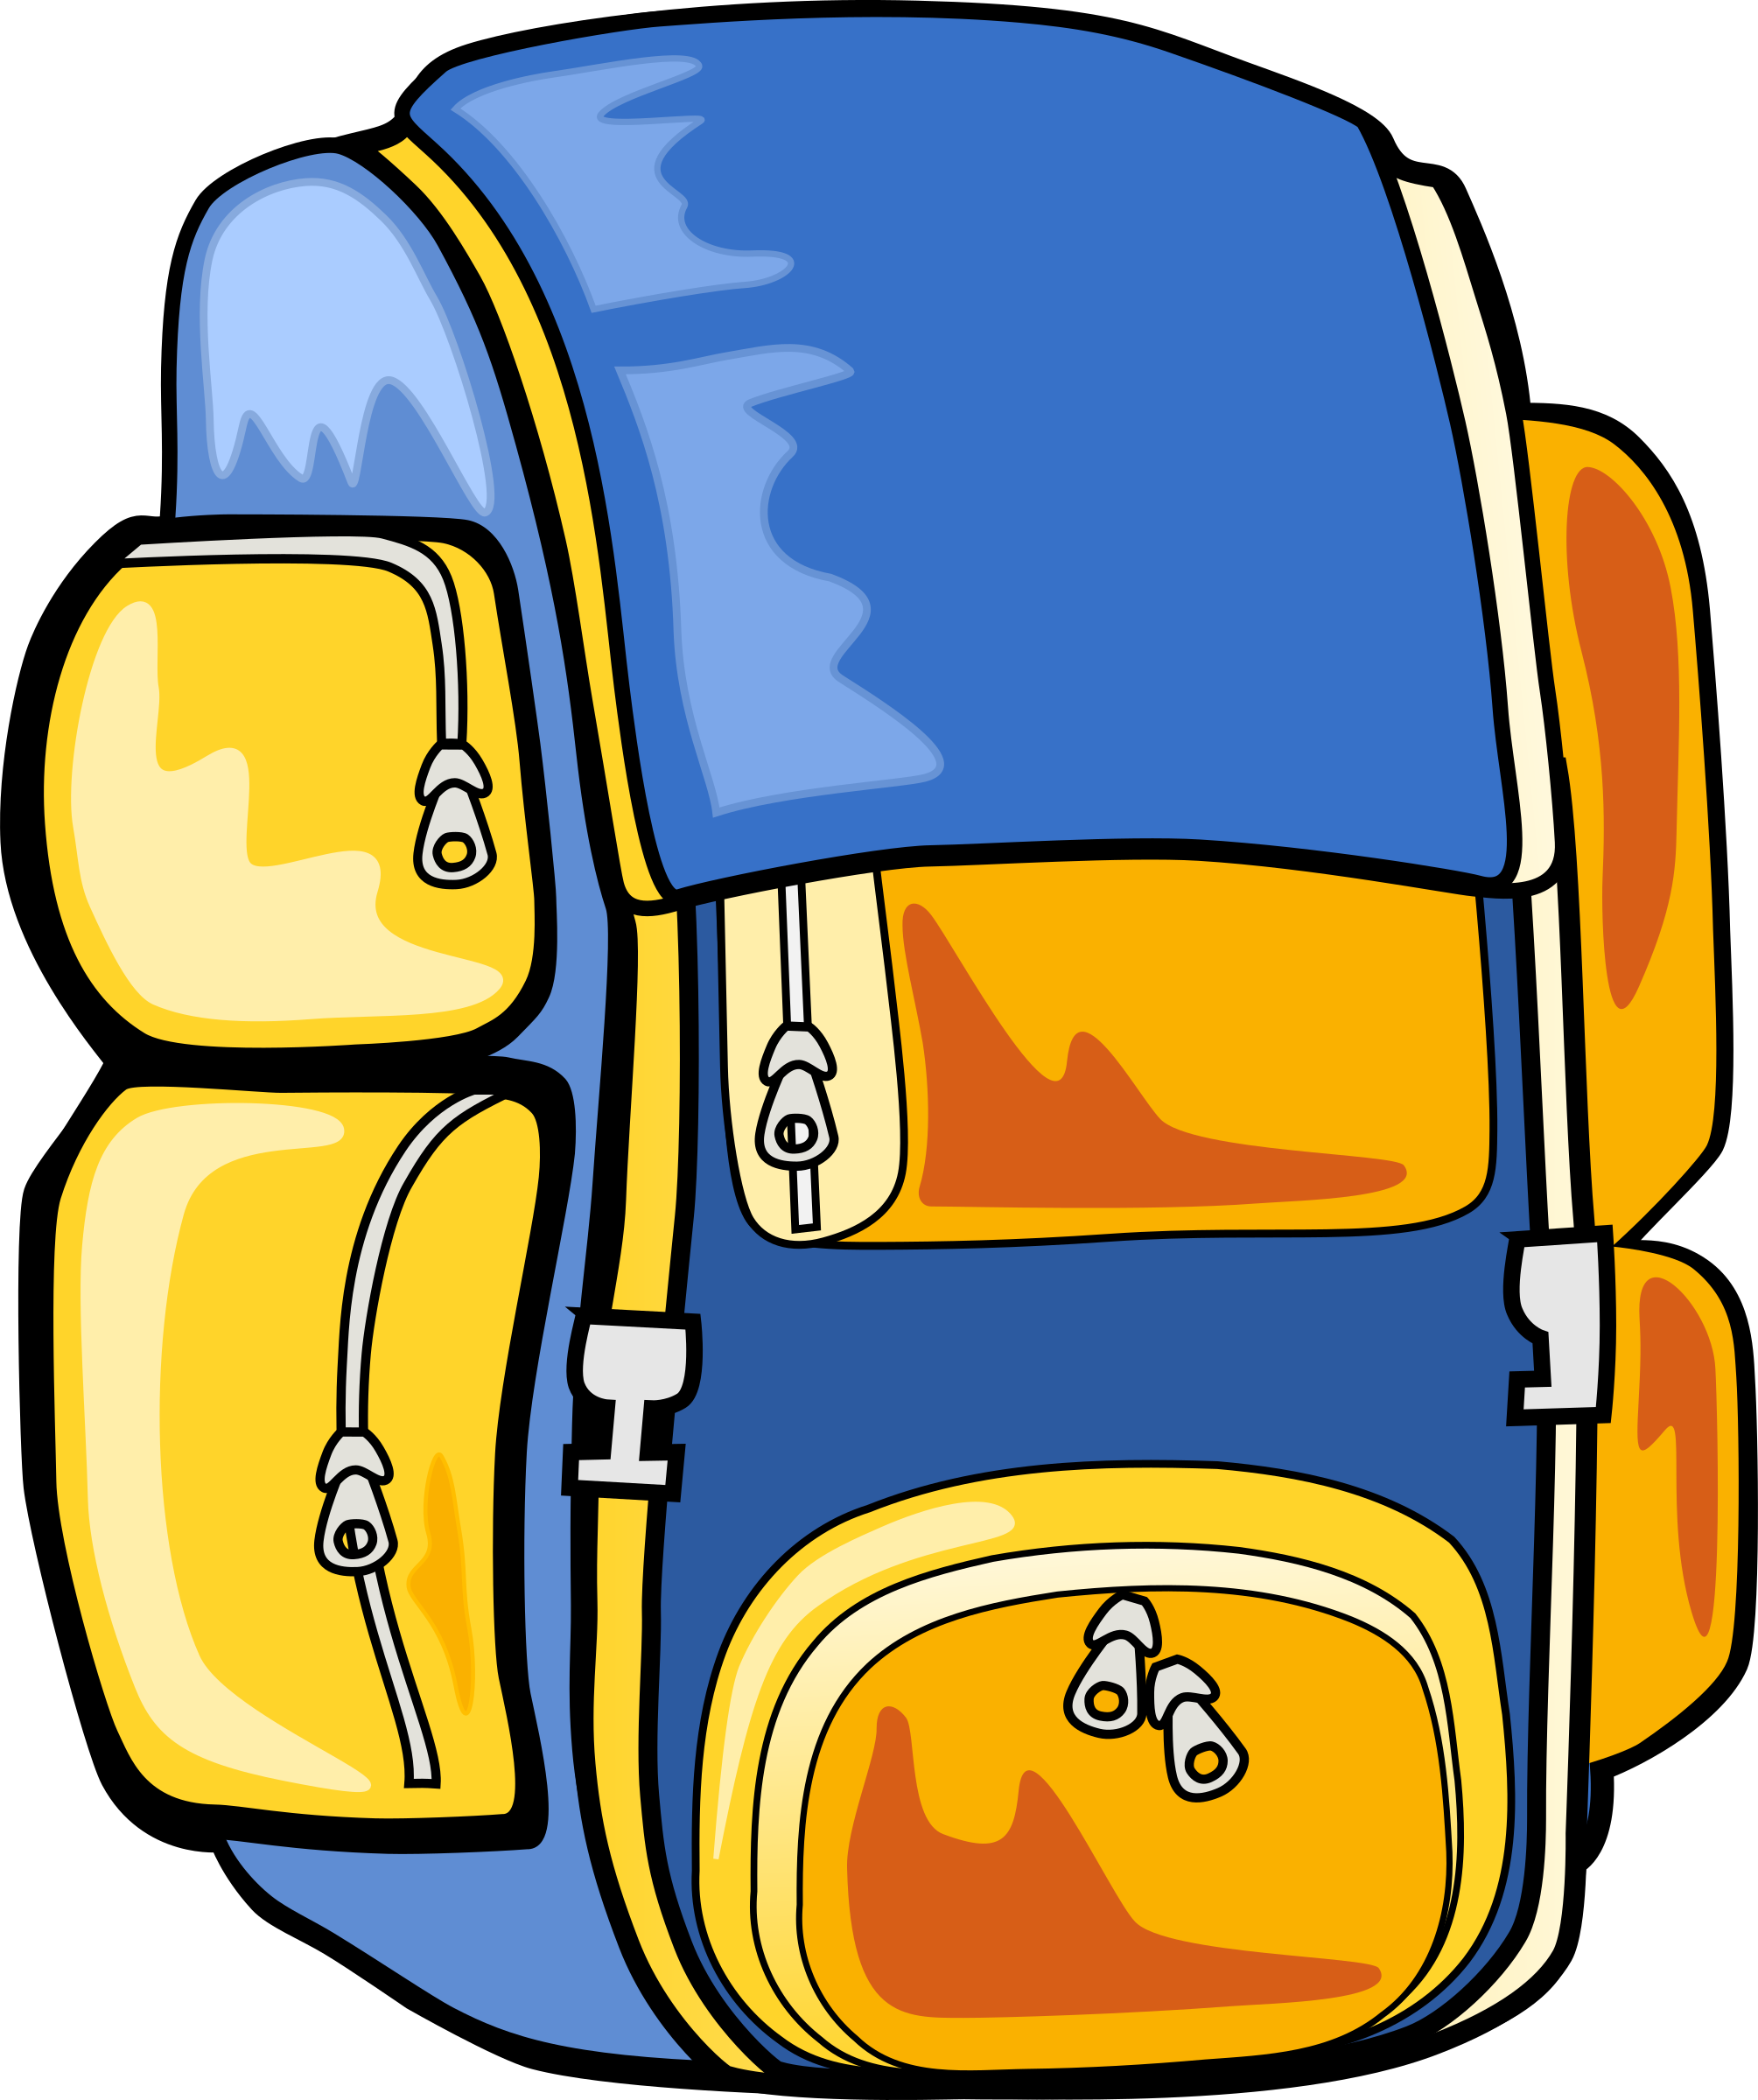 clip art royalty free download Bookbag clipart heavy. Backpack big image png